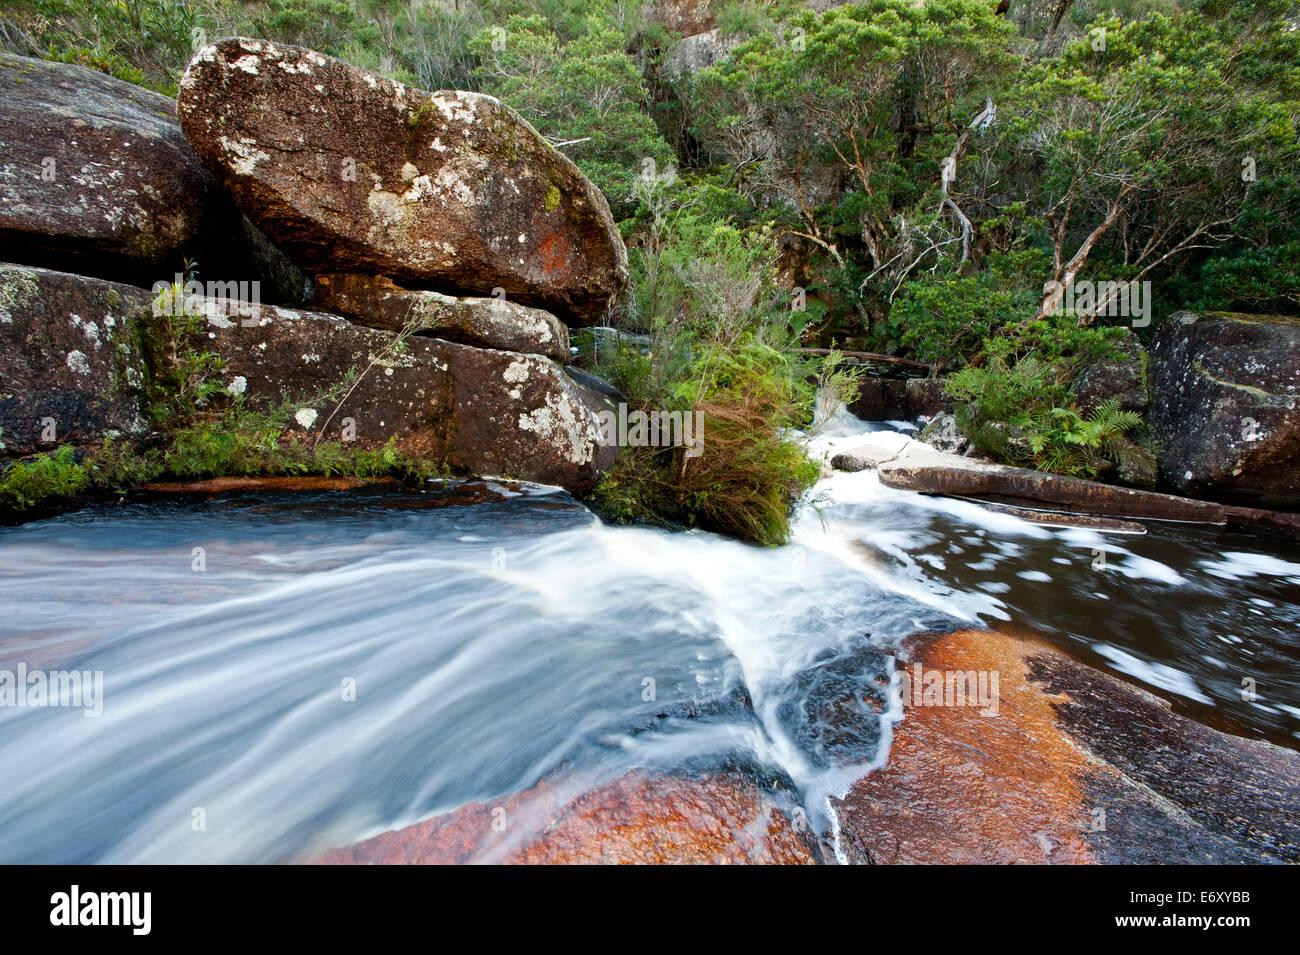 Genoa Falls, Croajingolong National Park, Victoria, Australia - Stock Image